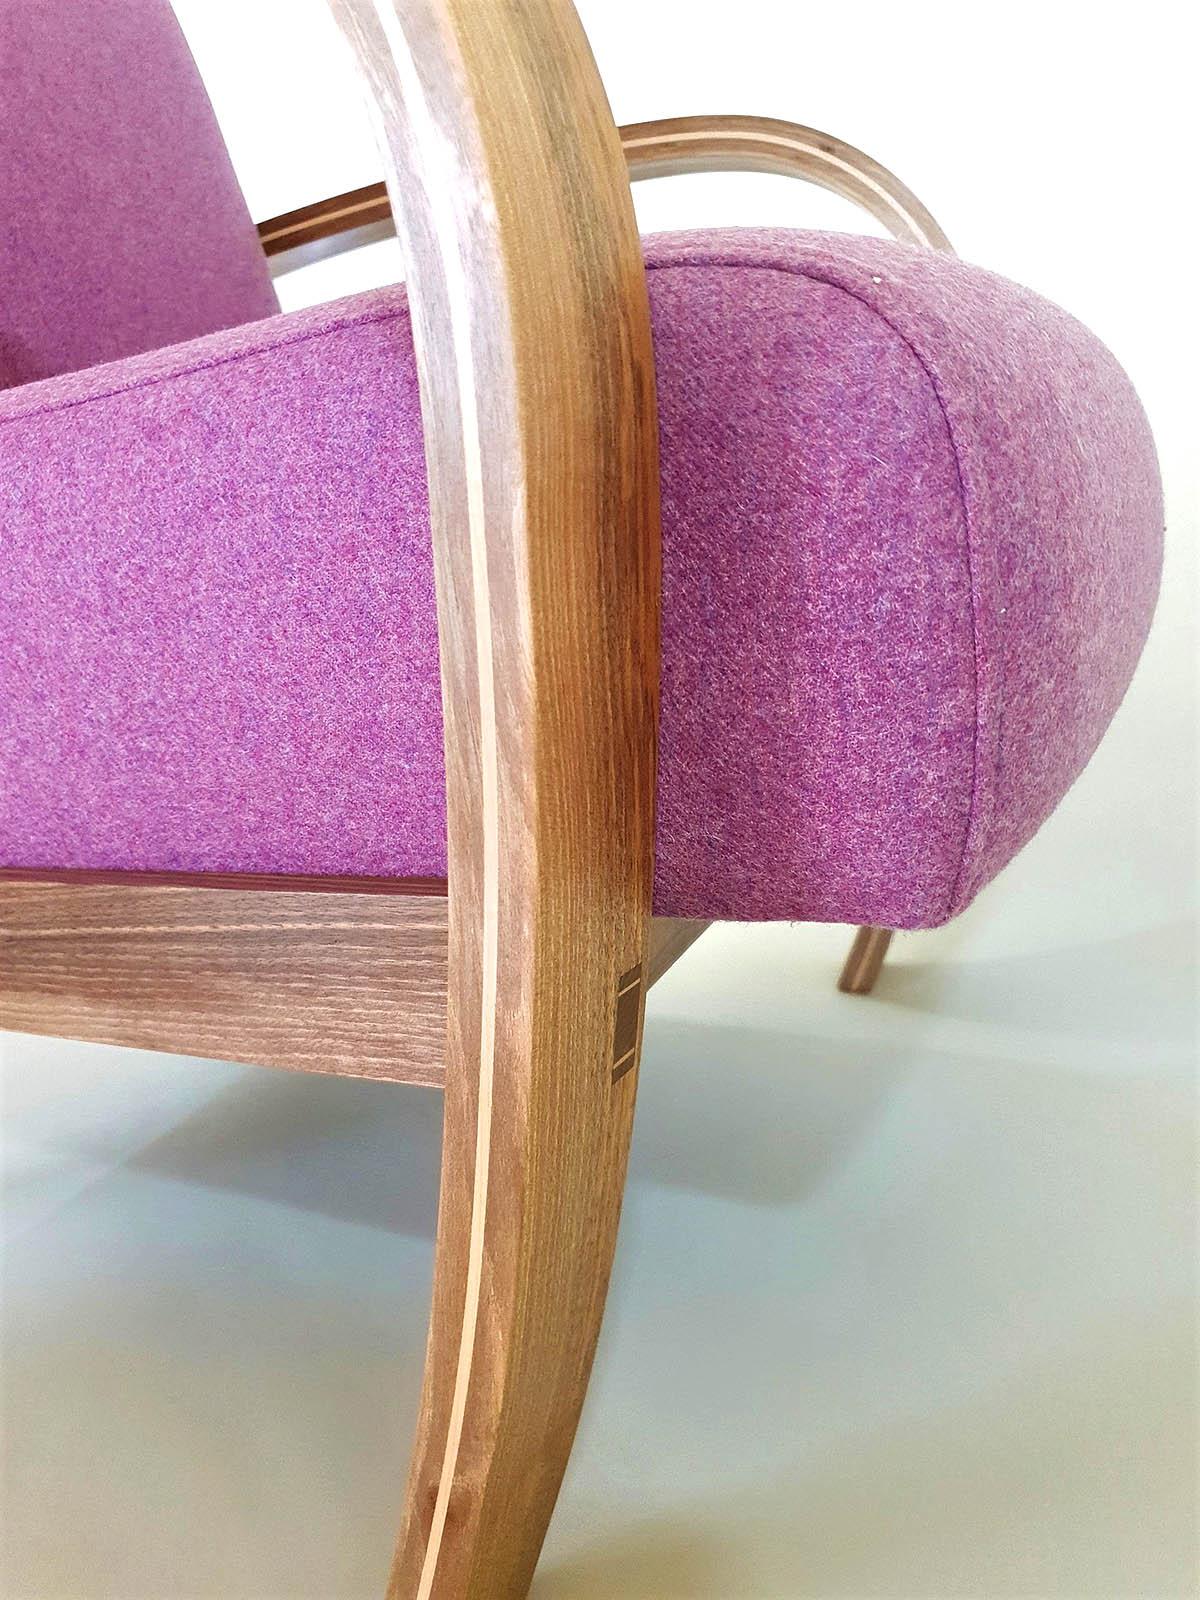 Tom Cooper, 'Deco Flow' armchair, walnut, fabric (detail)